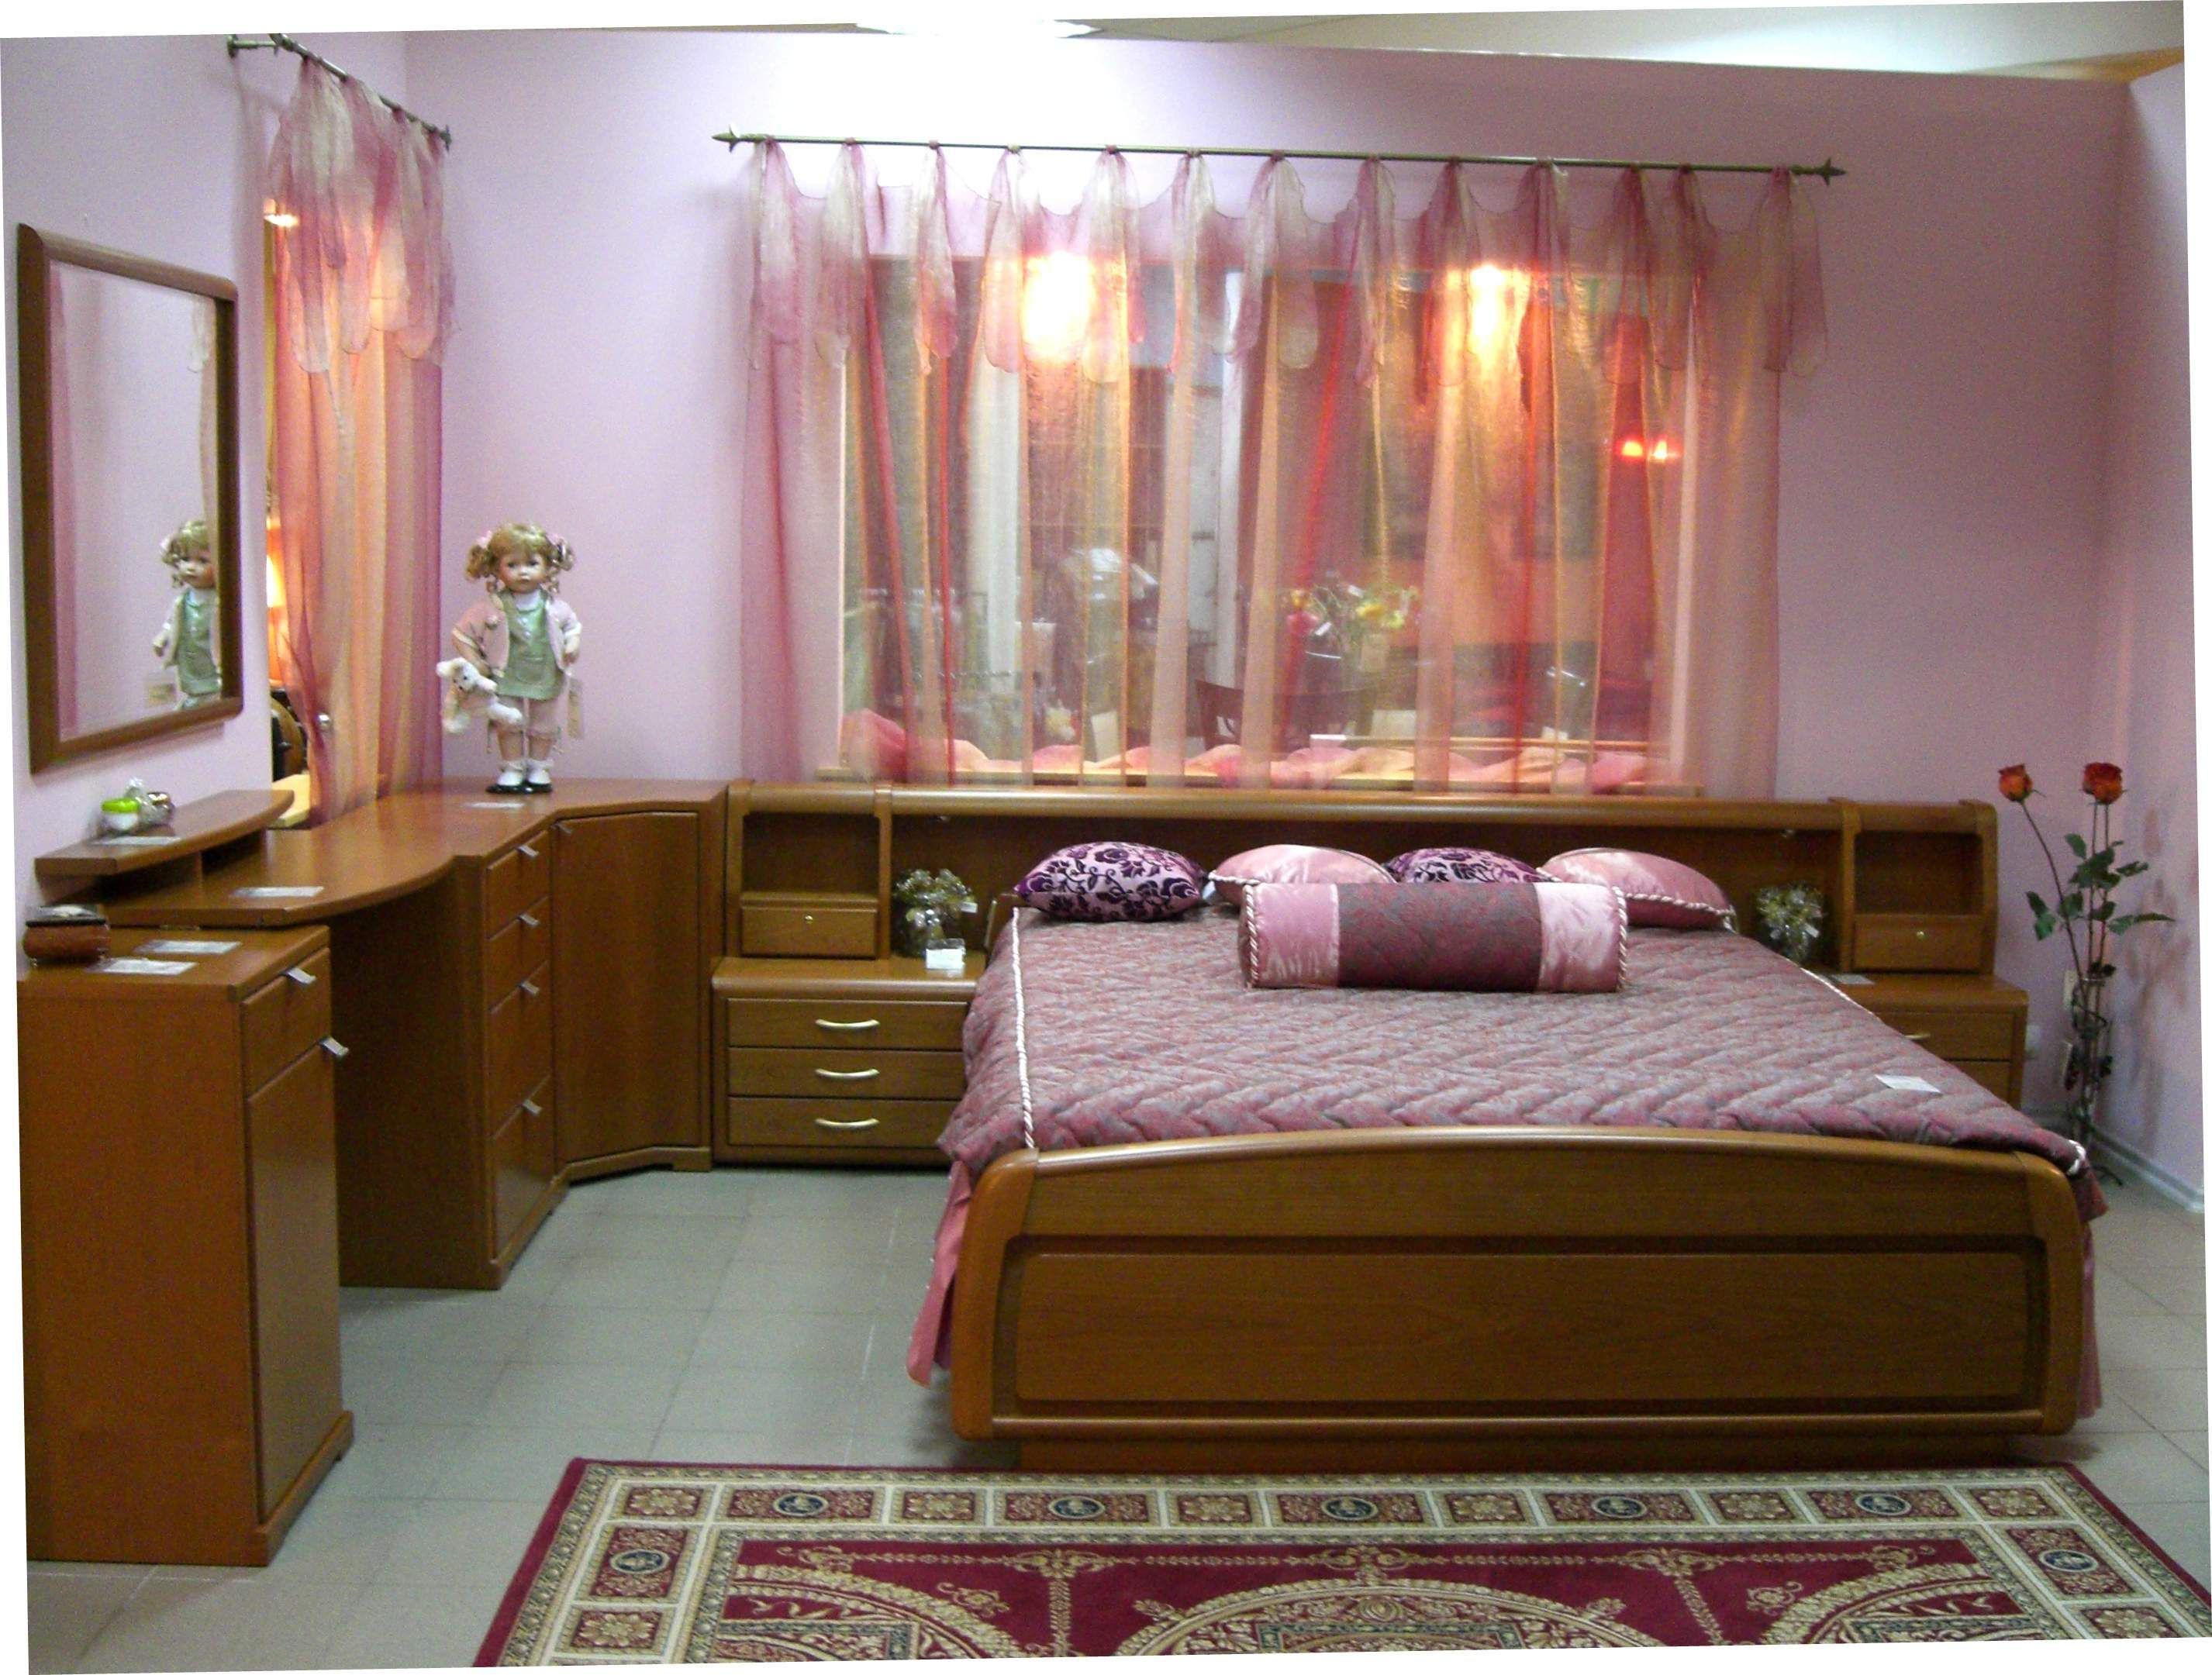 Interior Design Tips Tricks Helpful Advice Kerala Style Home Interior  Designs Kerala Home Design Floor